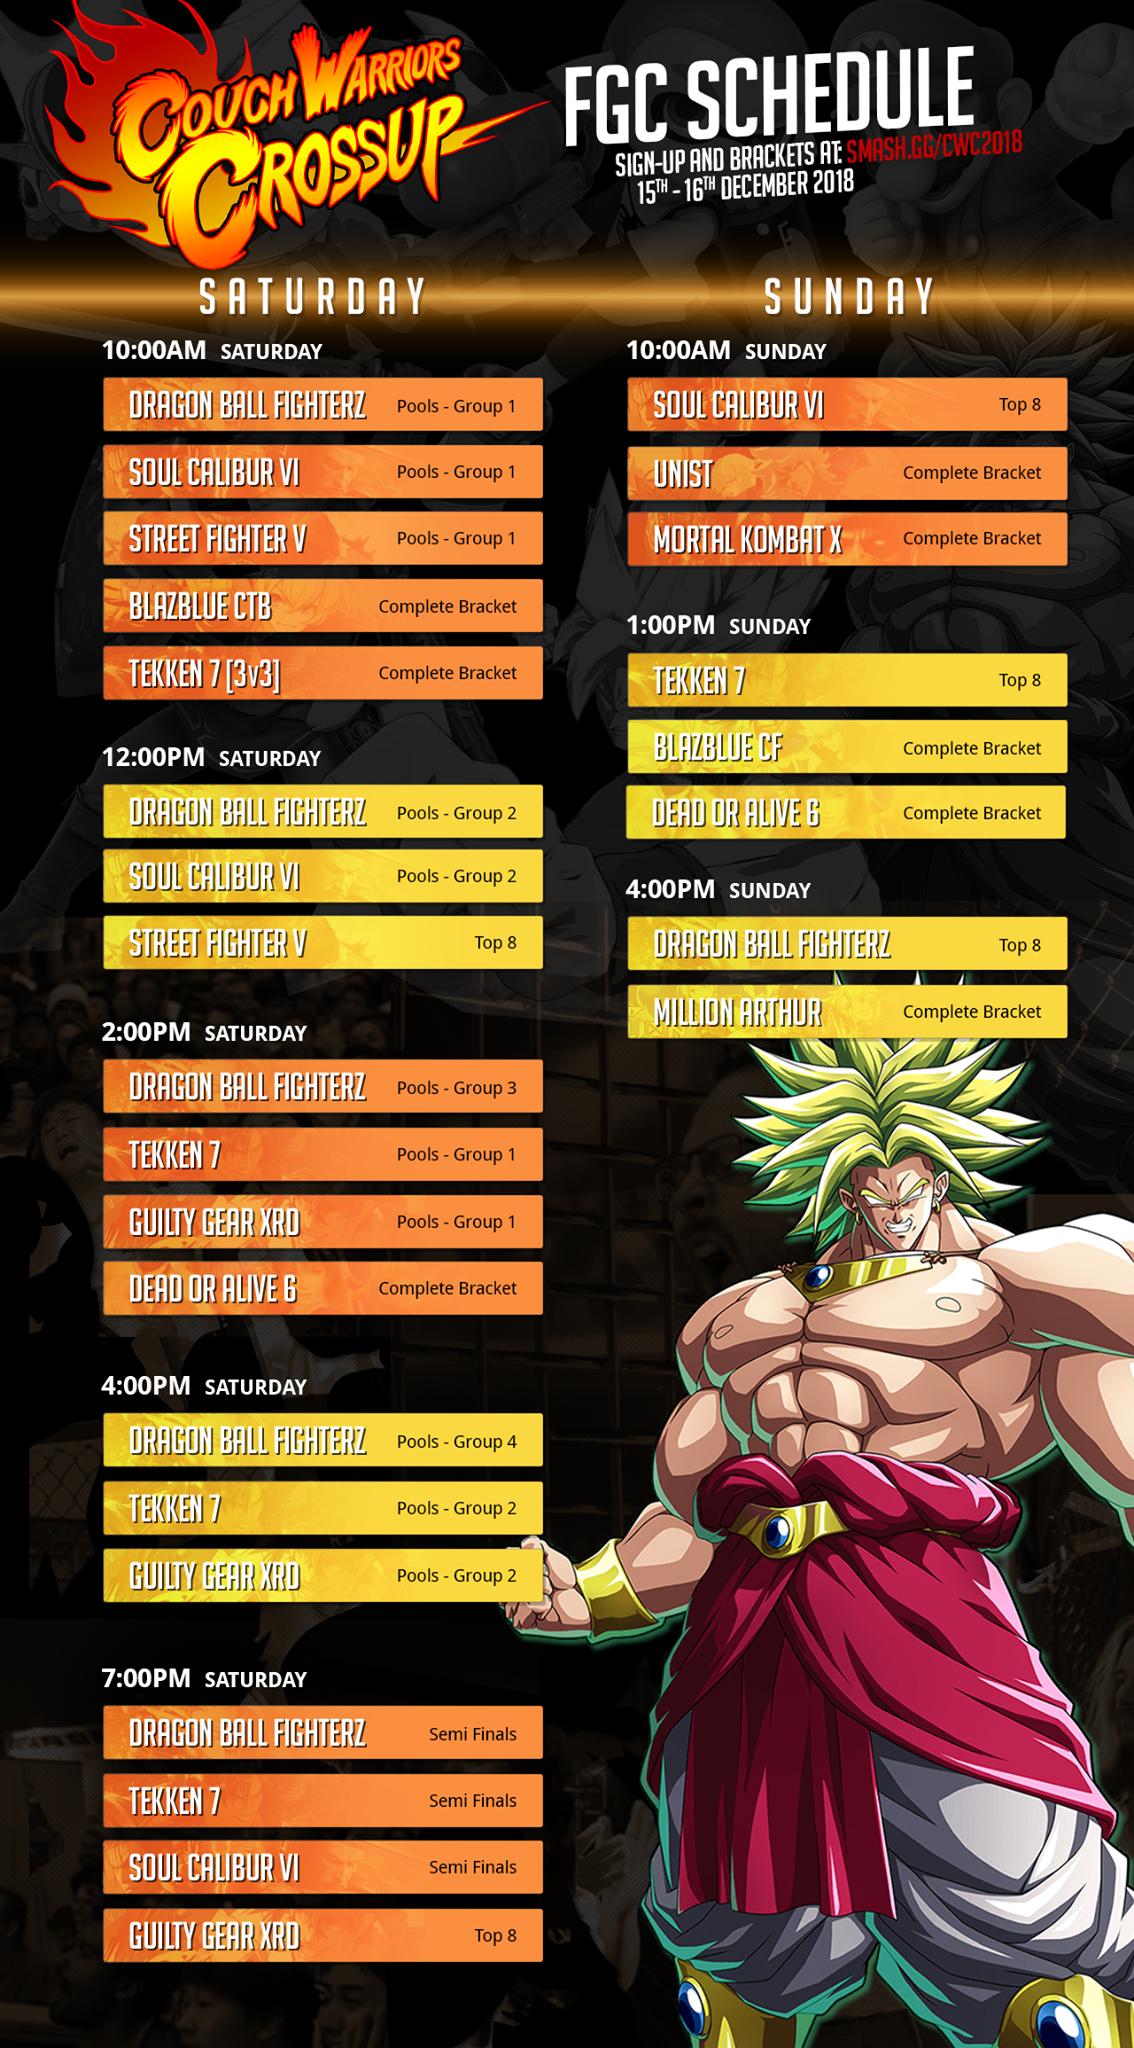 FGC Schedule